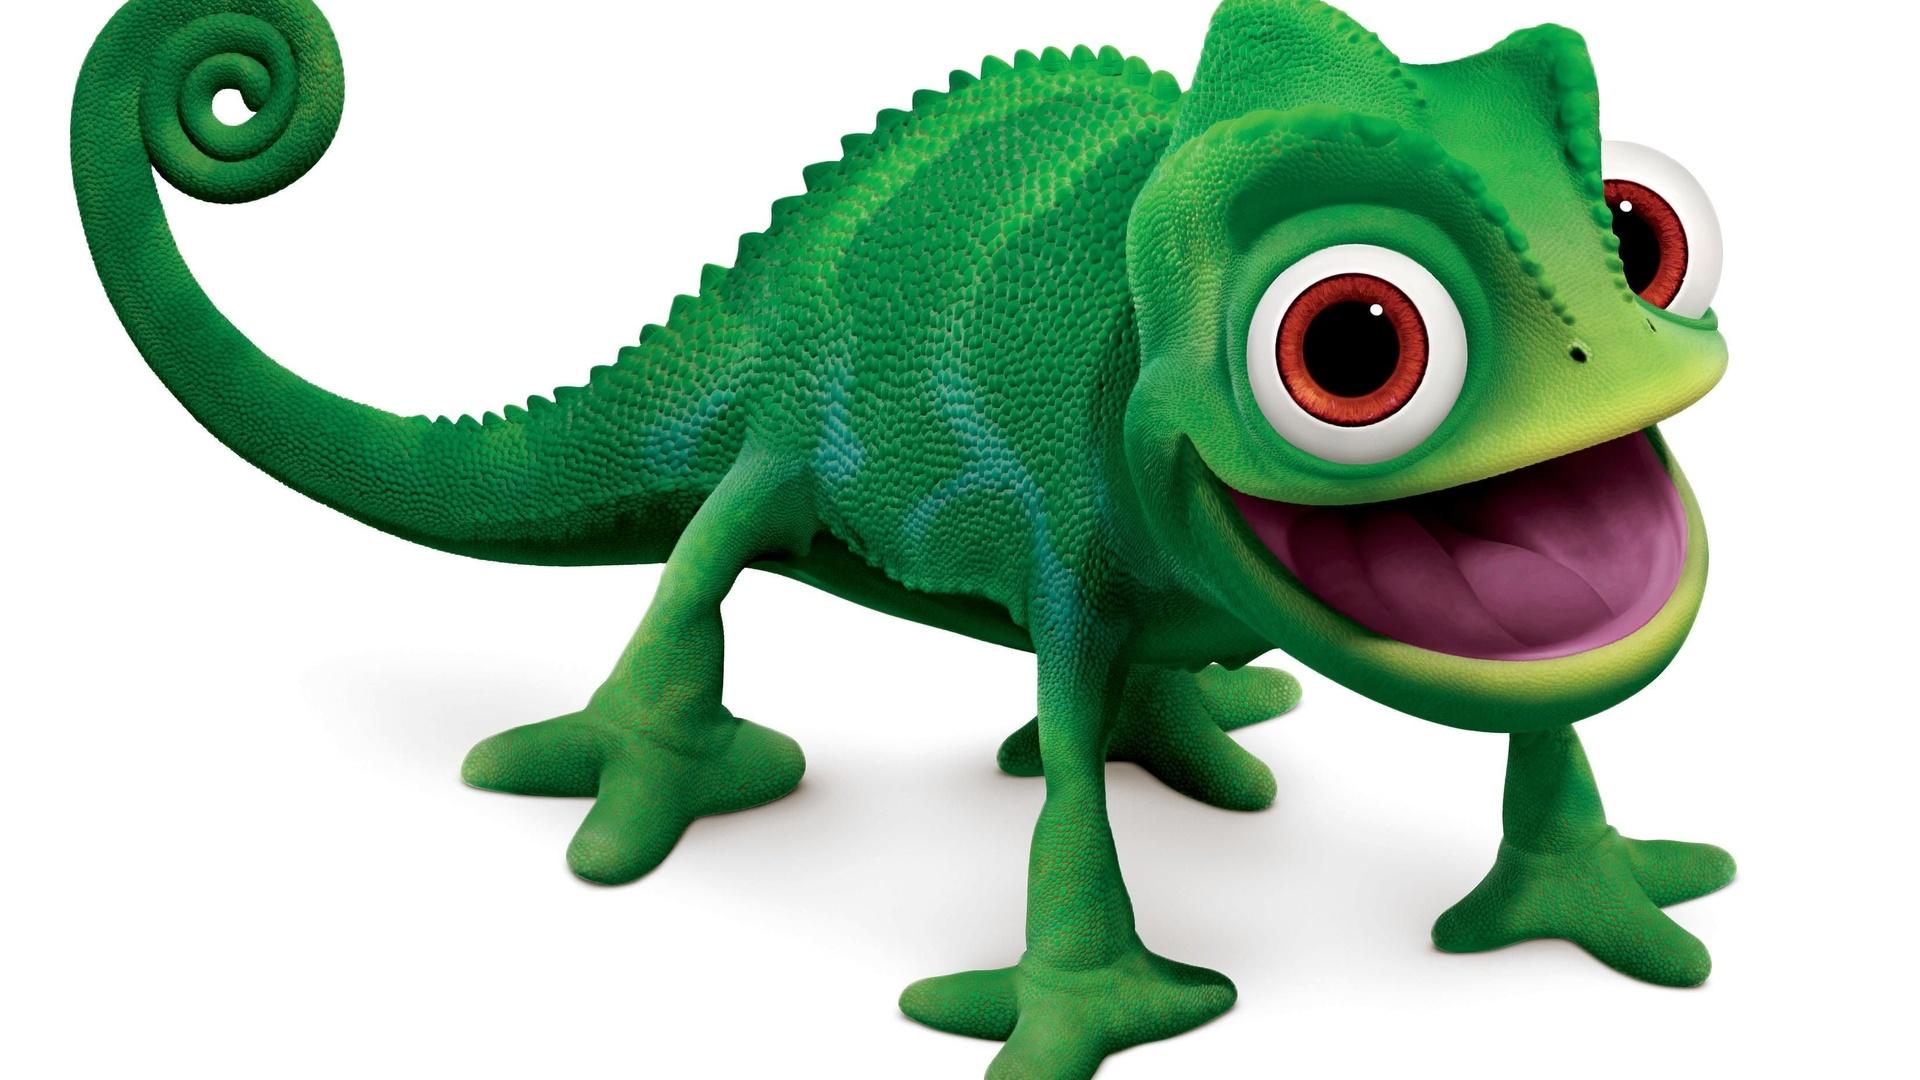 Green Chameleon Cartoon Character